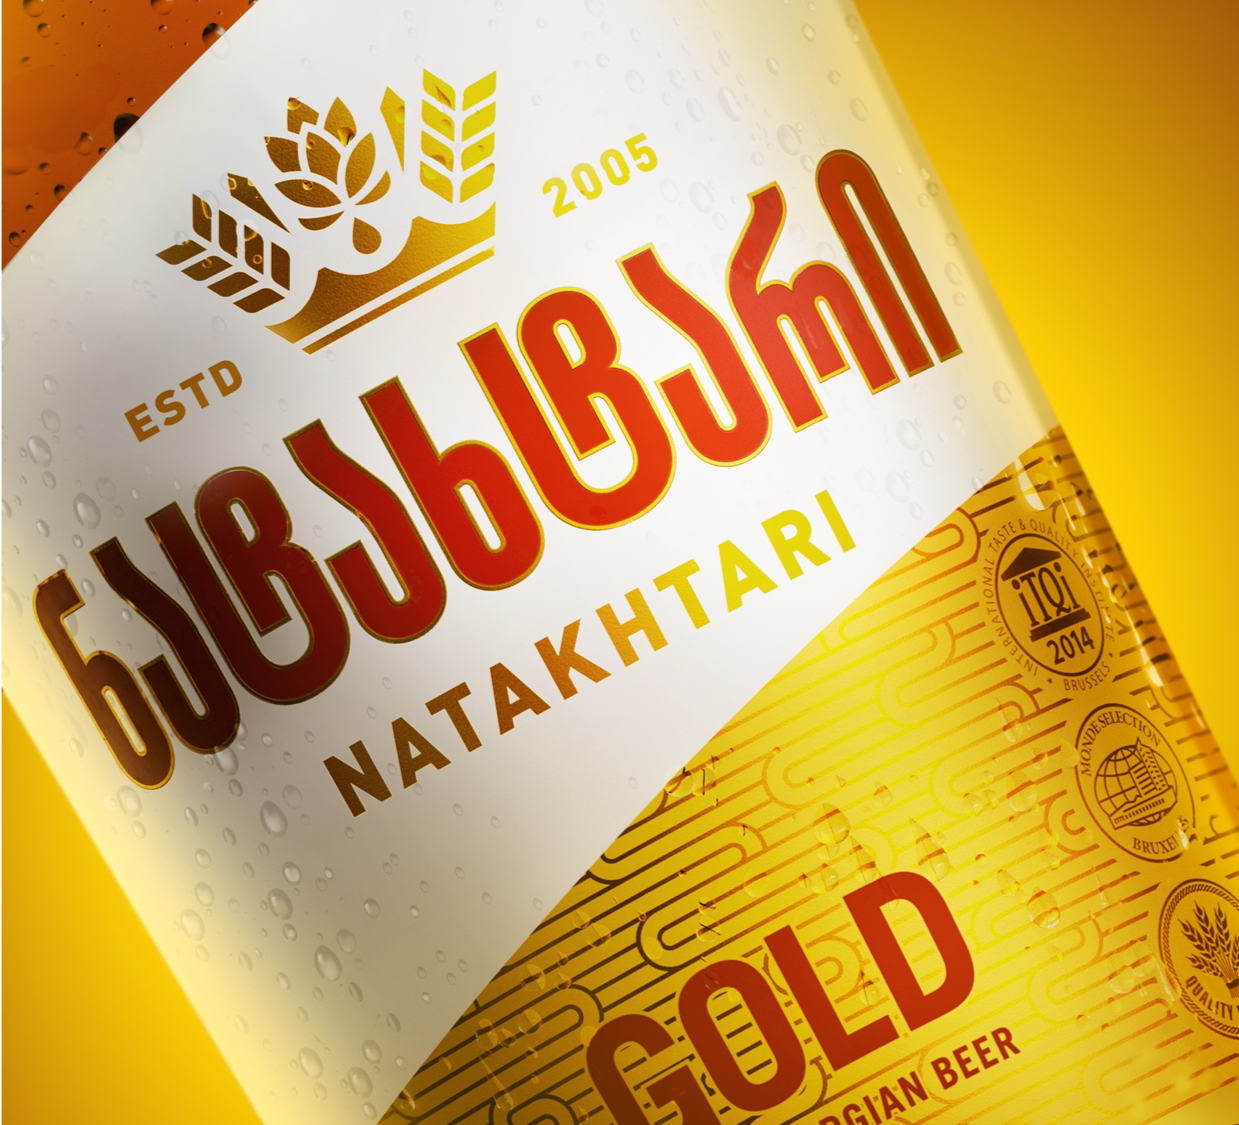 Brown&co - Natakhtari Beer 1.png